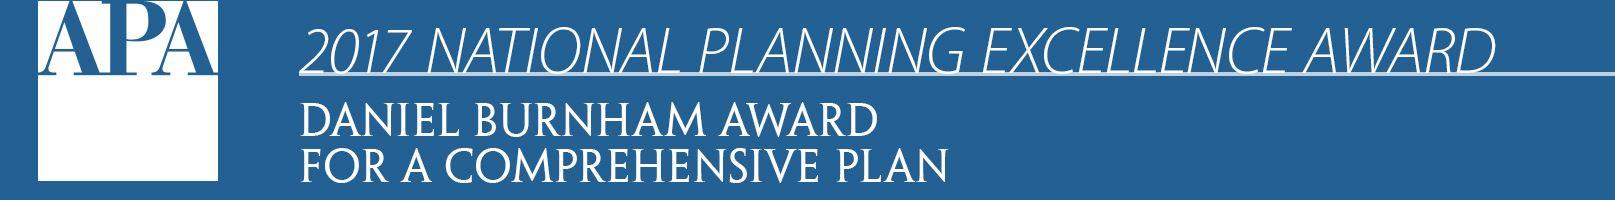 award winning plan plano tomorrow comprehensive plan official website